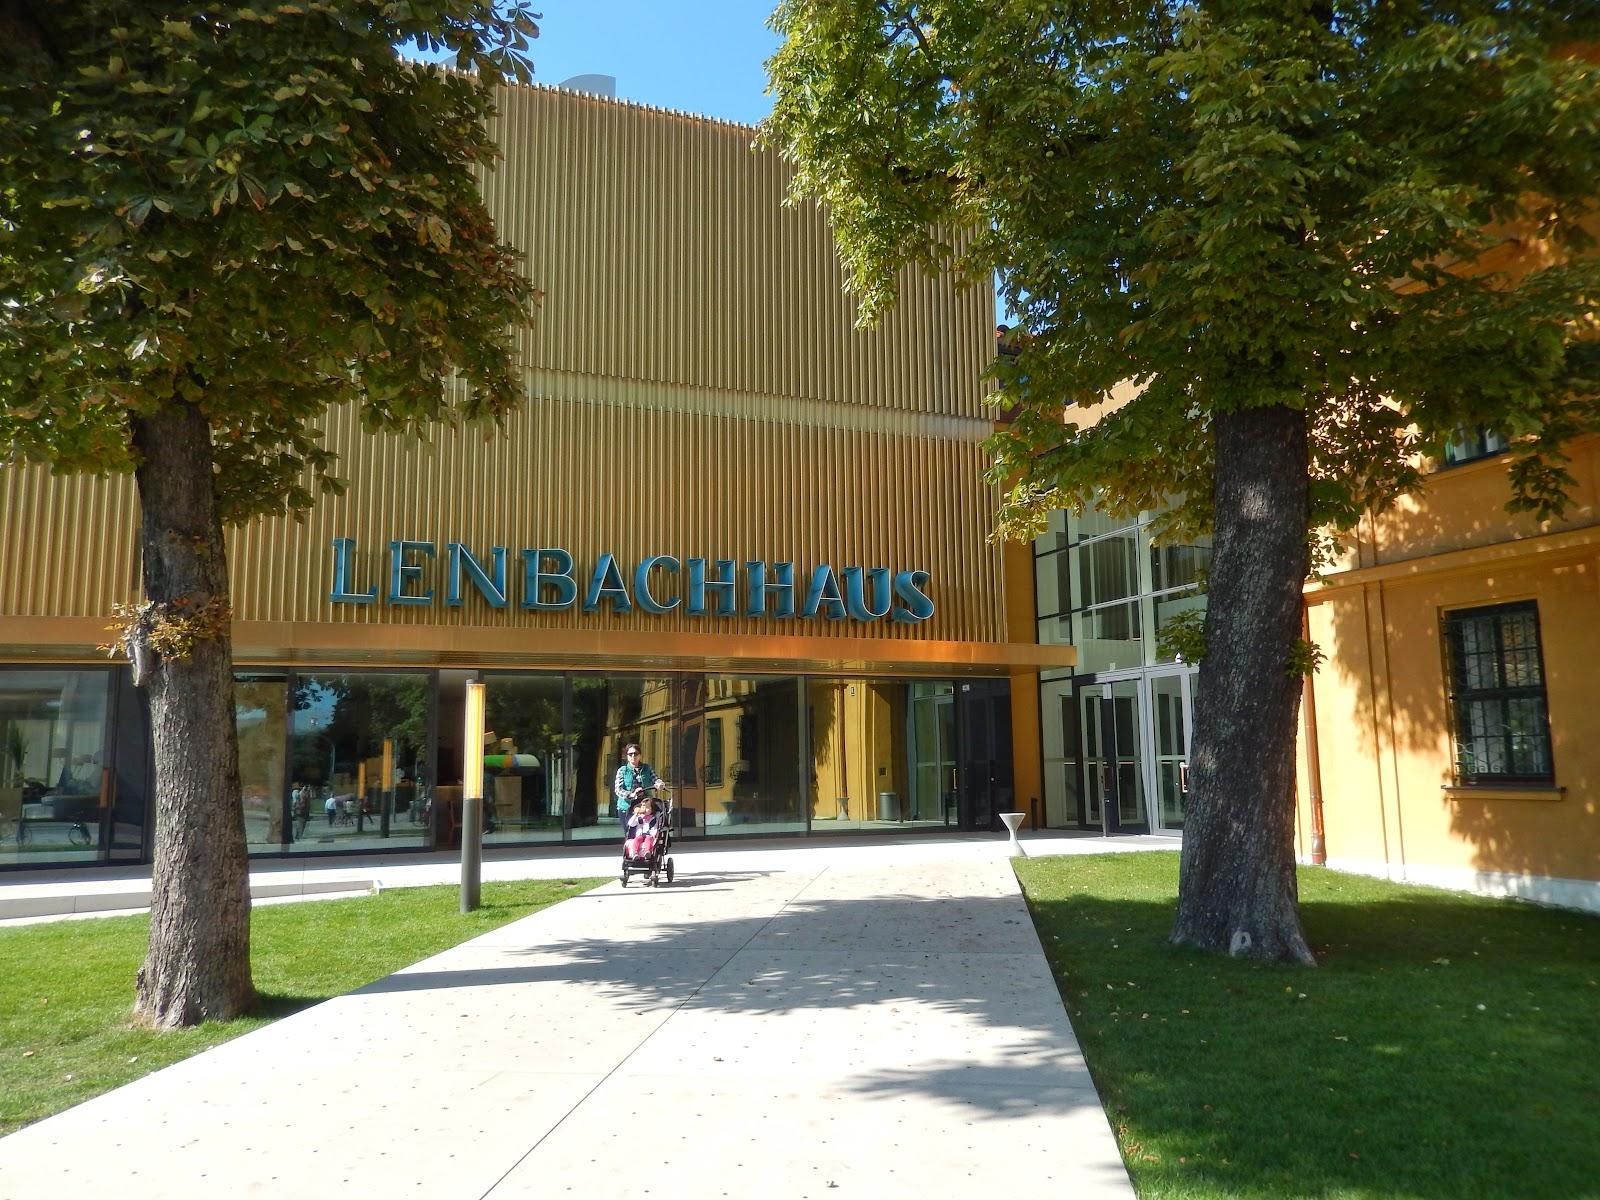 Lenbachhaus in München